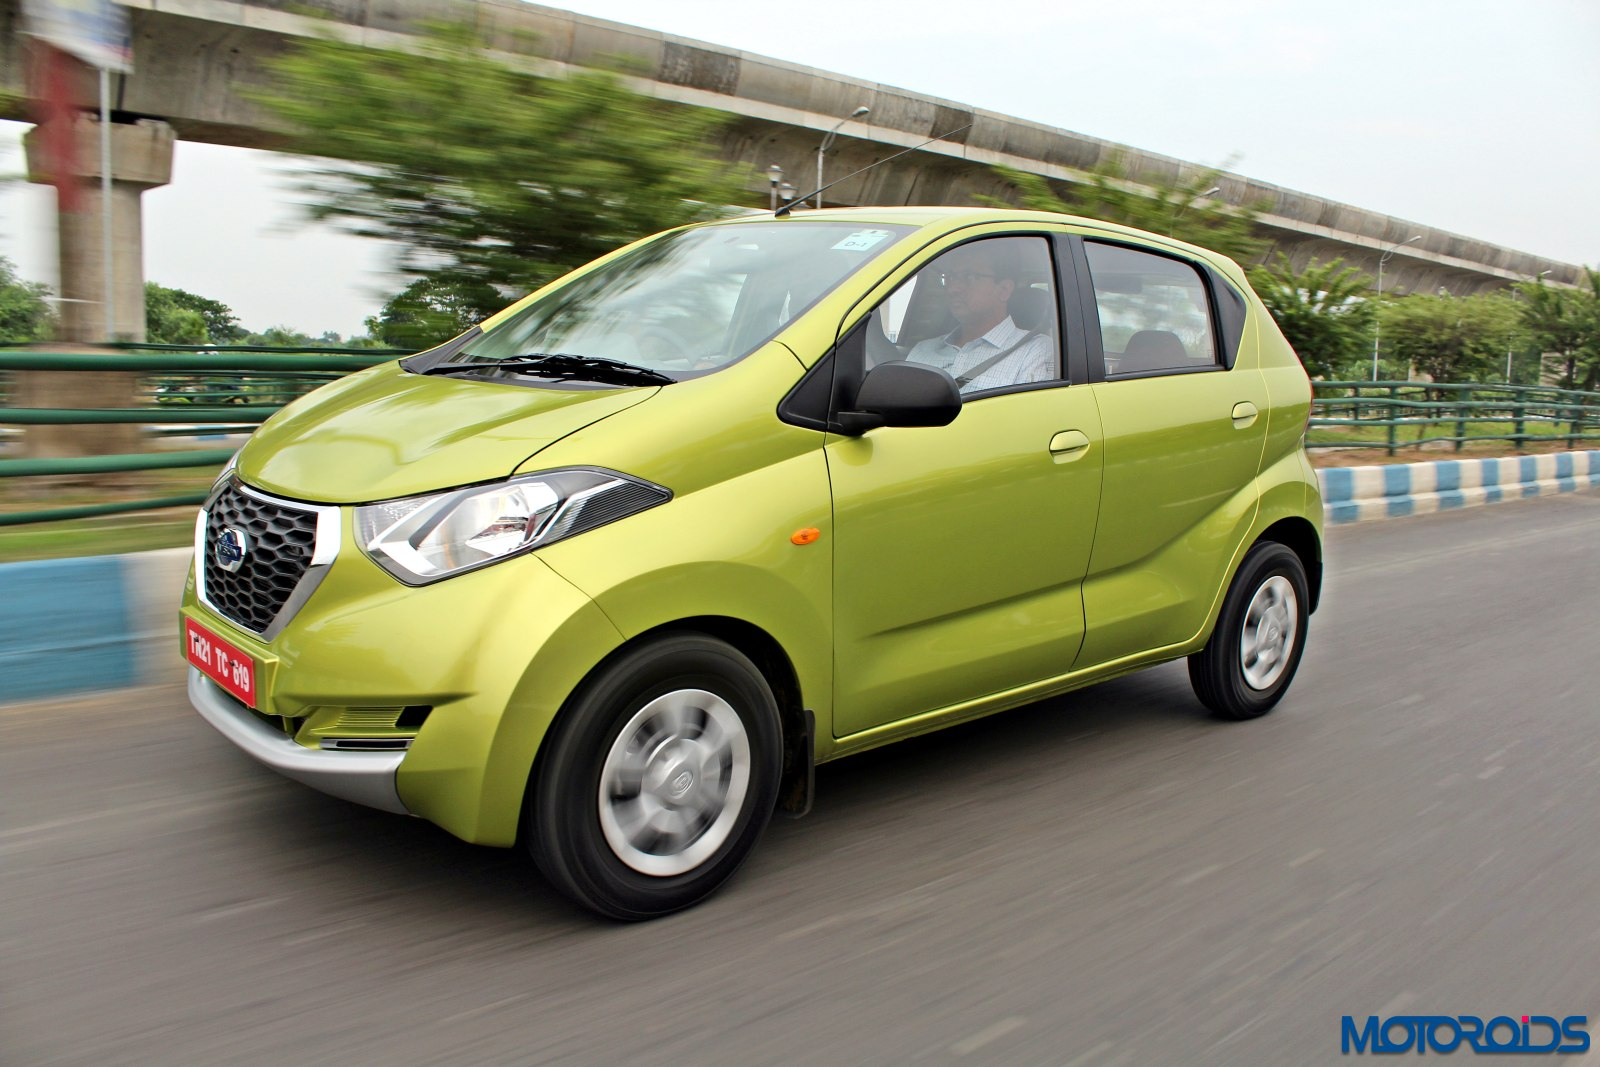 New Datsun Redi Go Image Gallery Motoroids